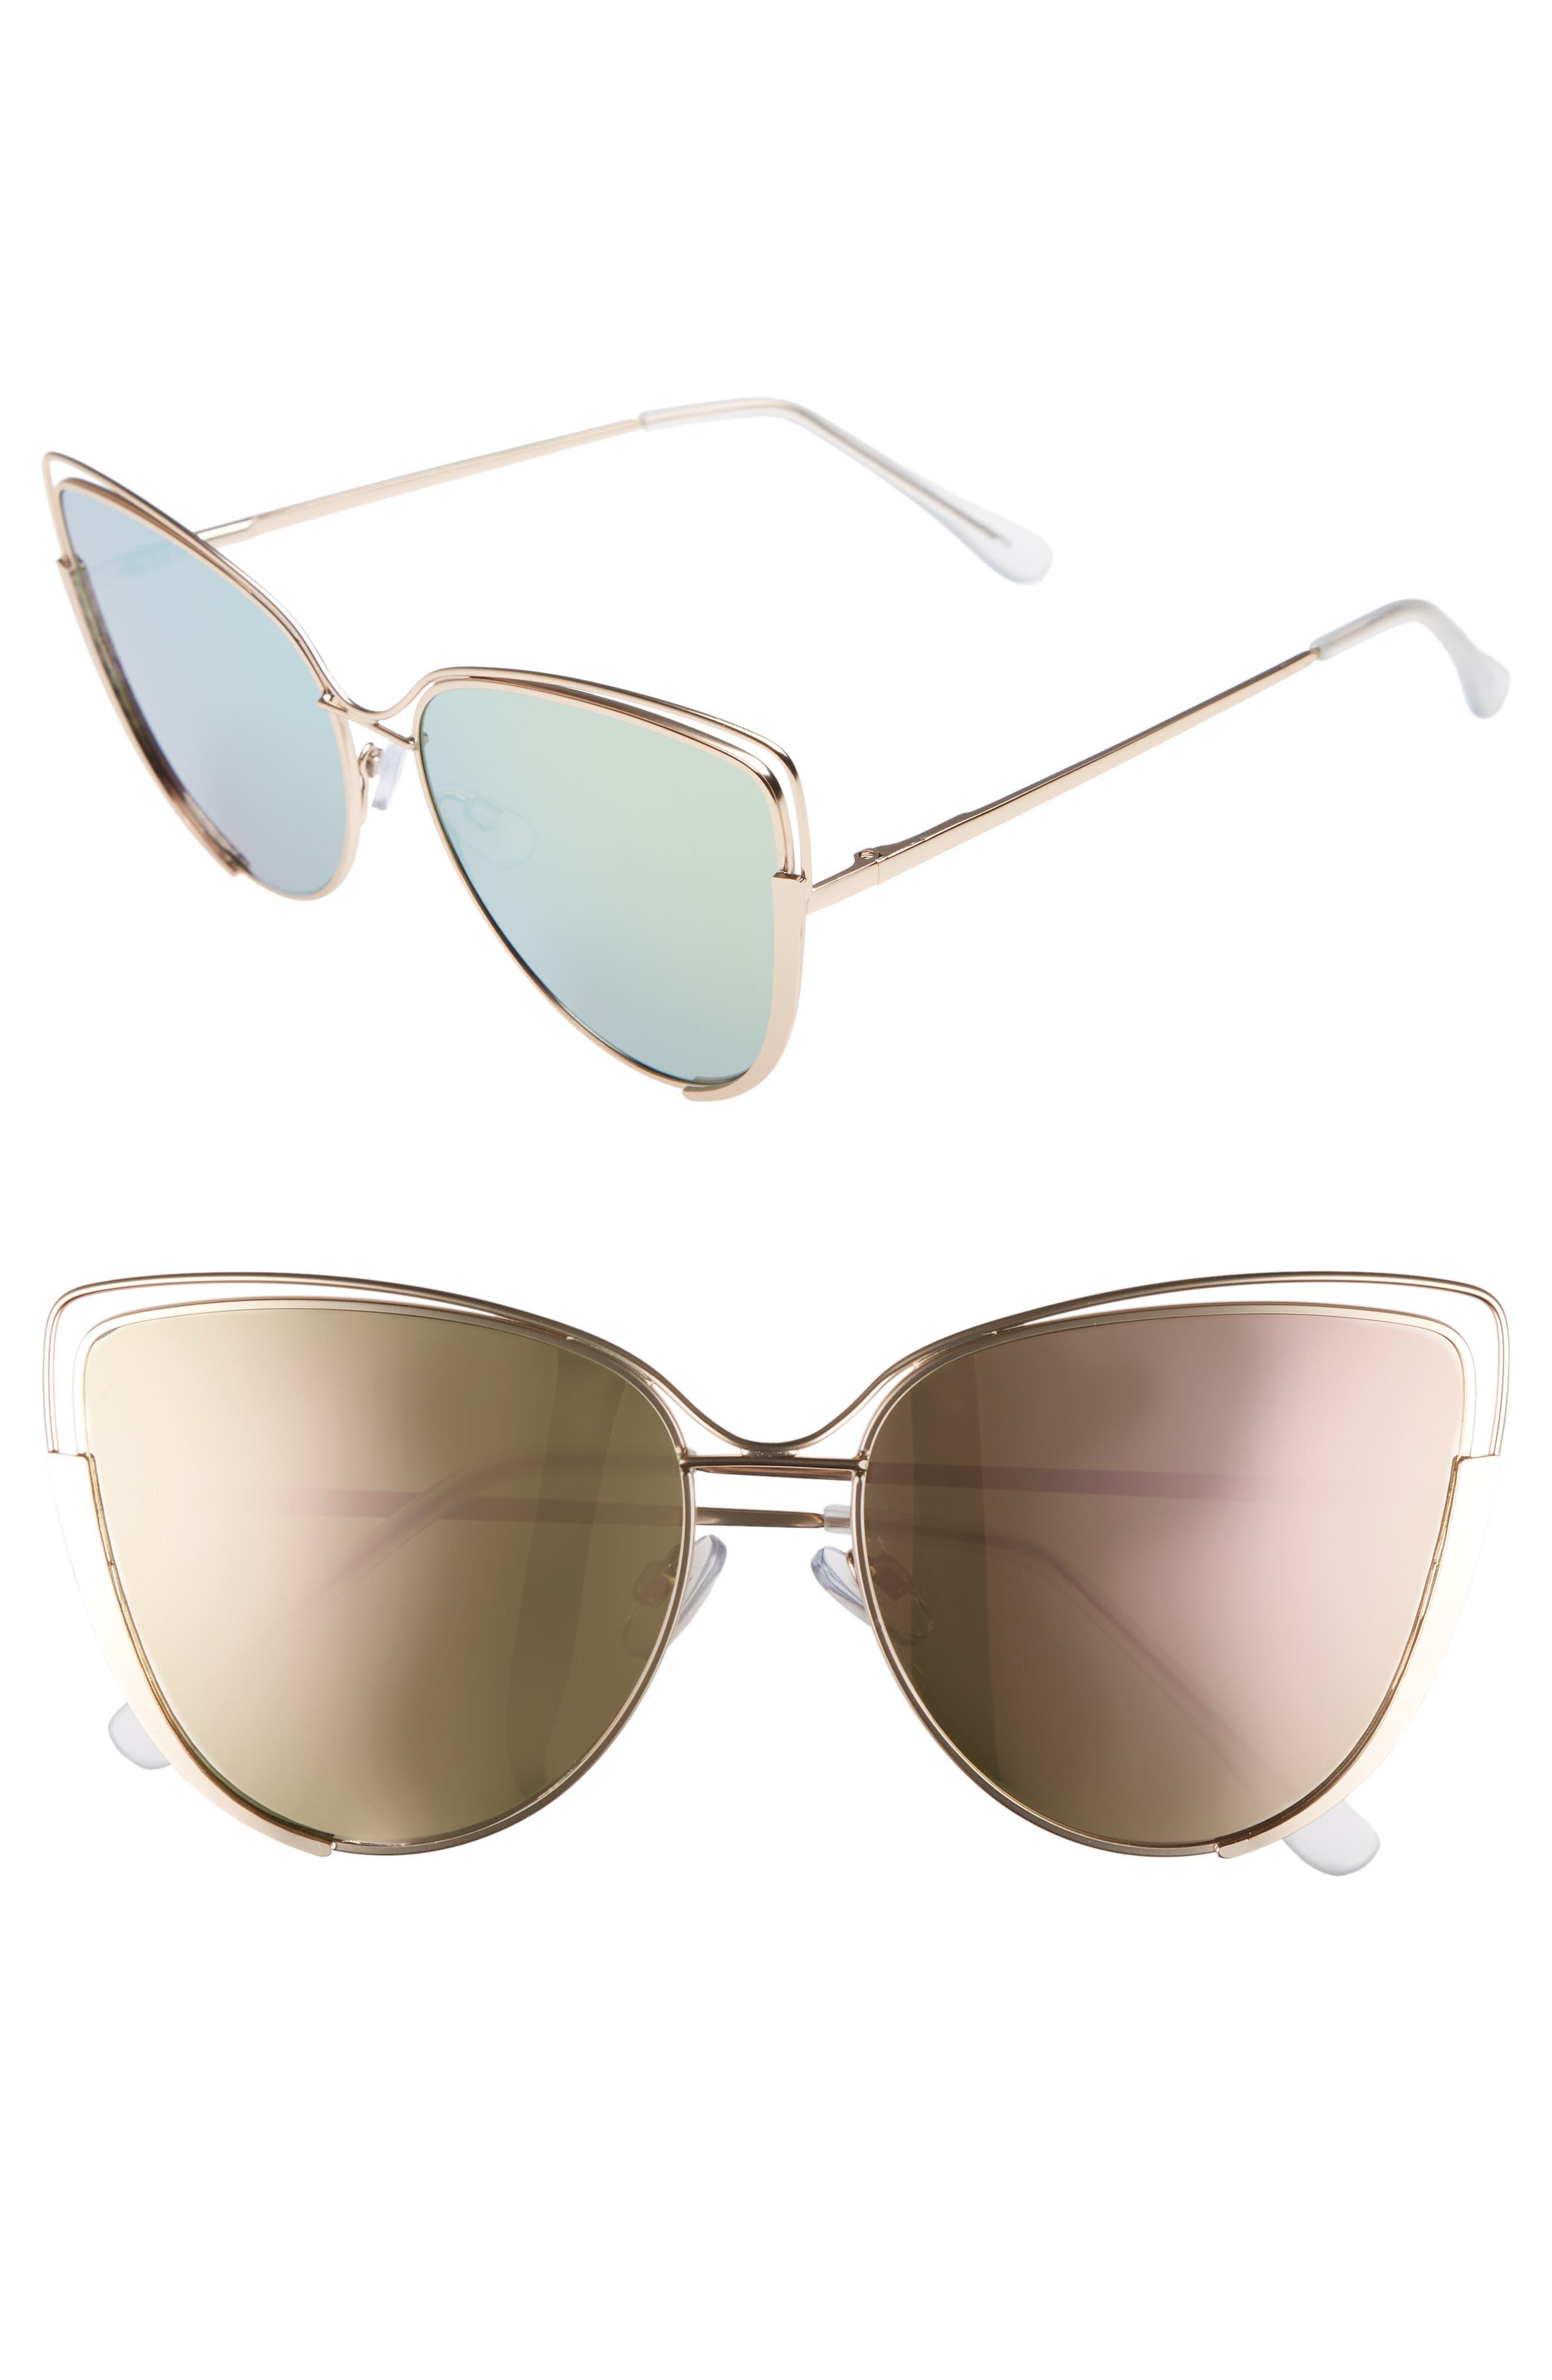 Futuristic Cat Eye Sunglasses,                         Main,                         color, Gold